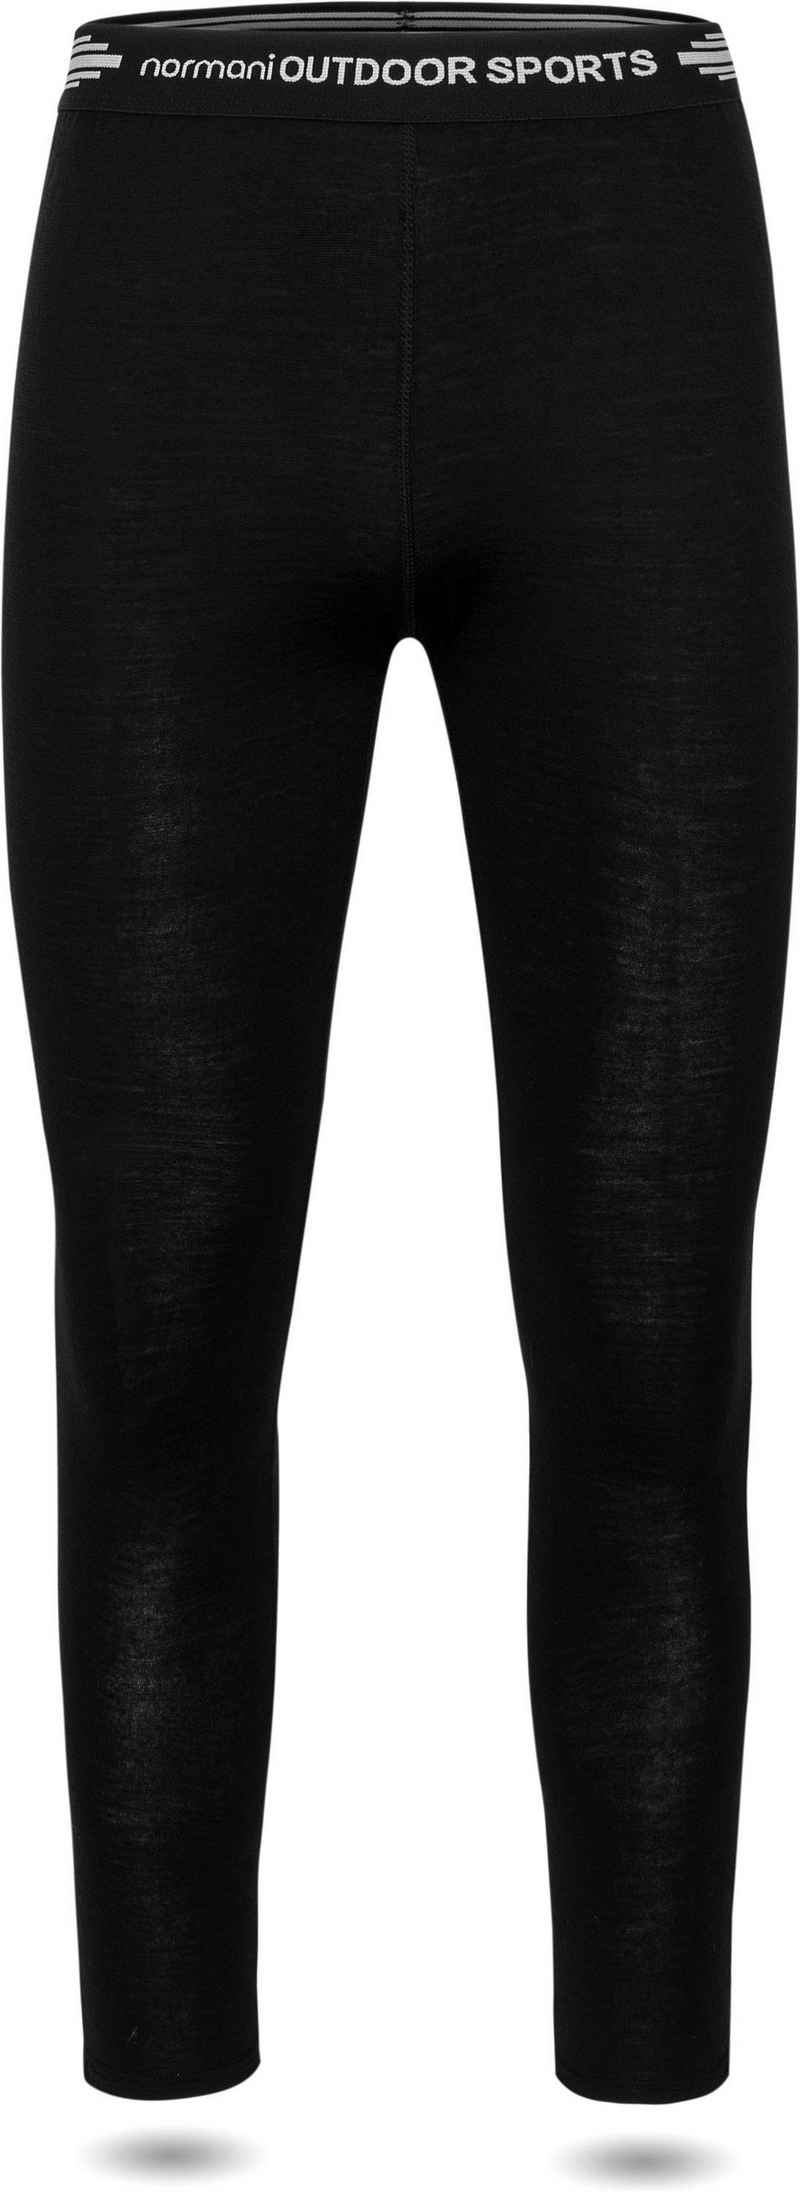 normani Thermounterhose »Damen Merino Unterhose Perth« Thermohose Funktionshose Winter-Unterziehhose - 100% Merinowolle